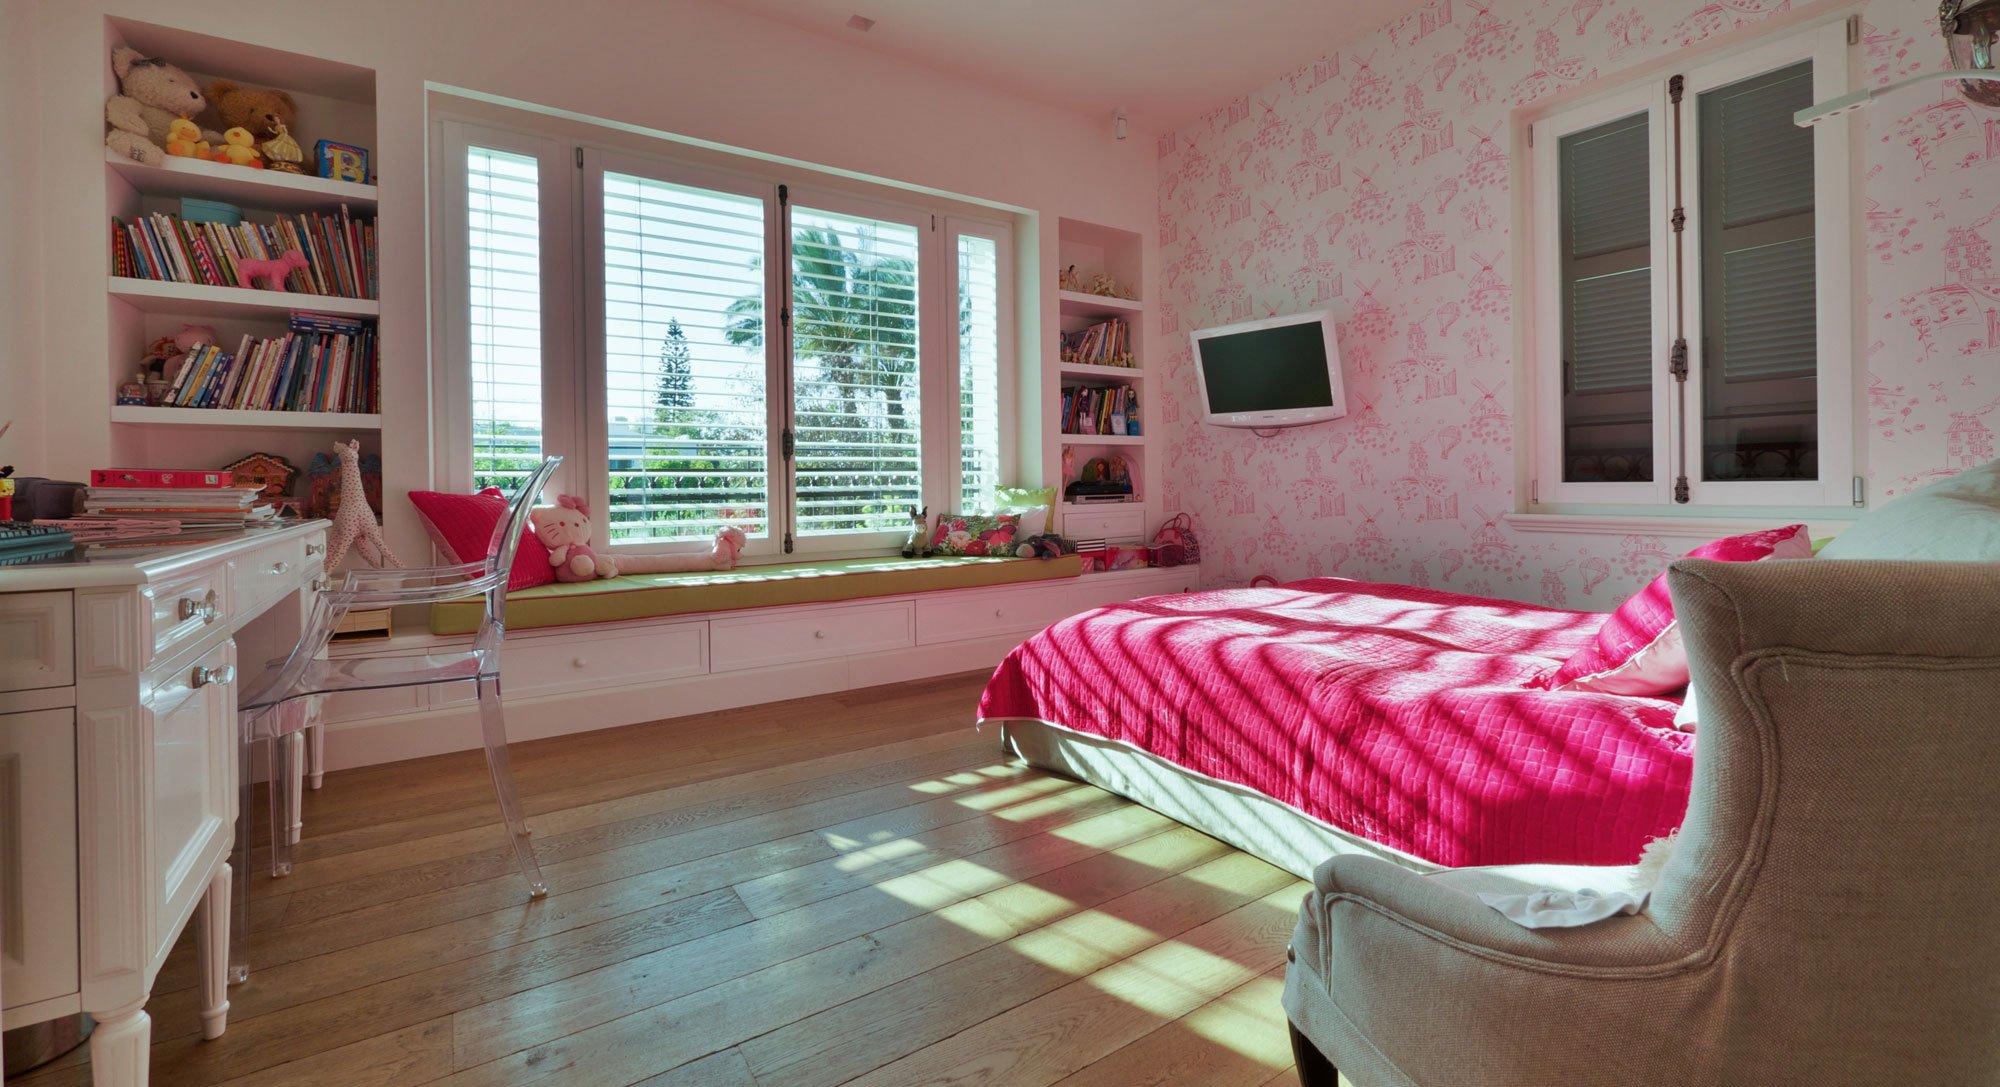 Home-in-Herzlia-Pituach-22